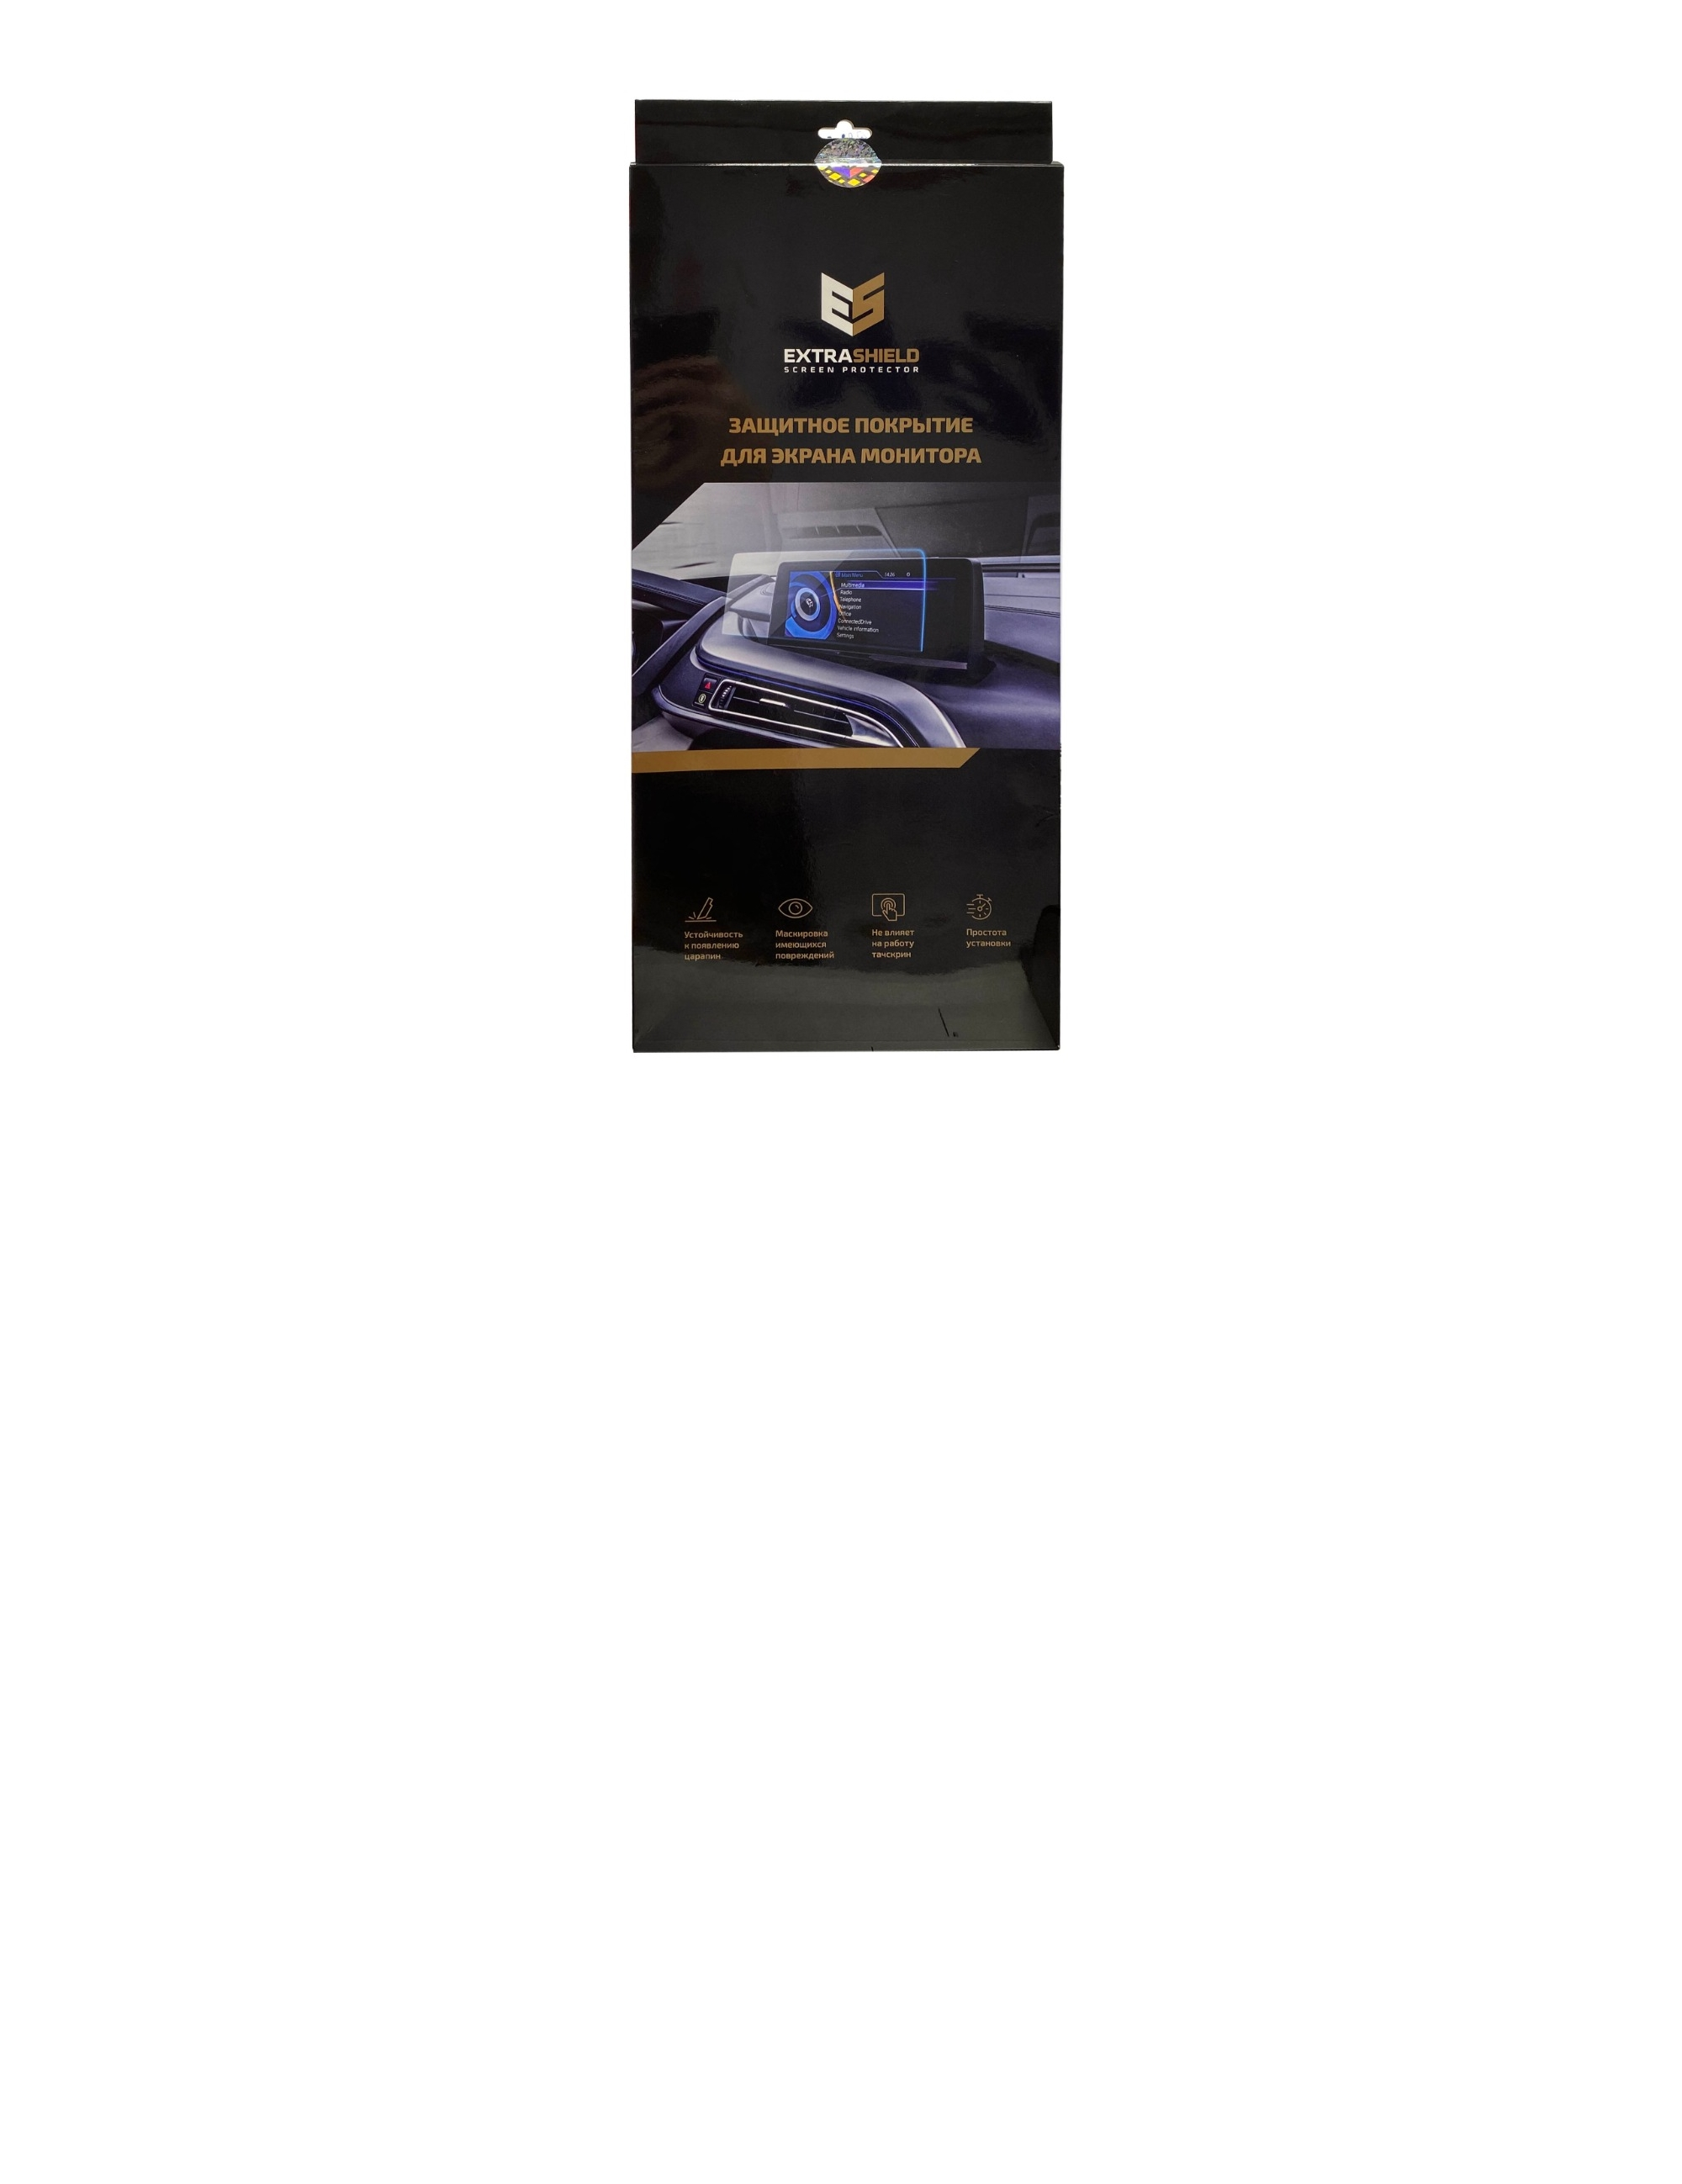 Audi A7 I (4G) 2014 - 2018 мультимедиа MMI 8 Защитное стекло Матовая